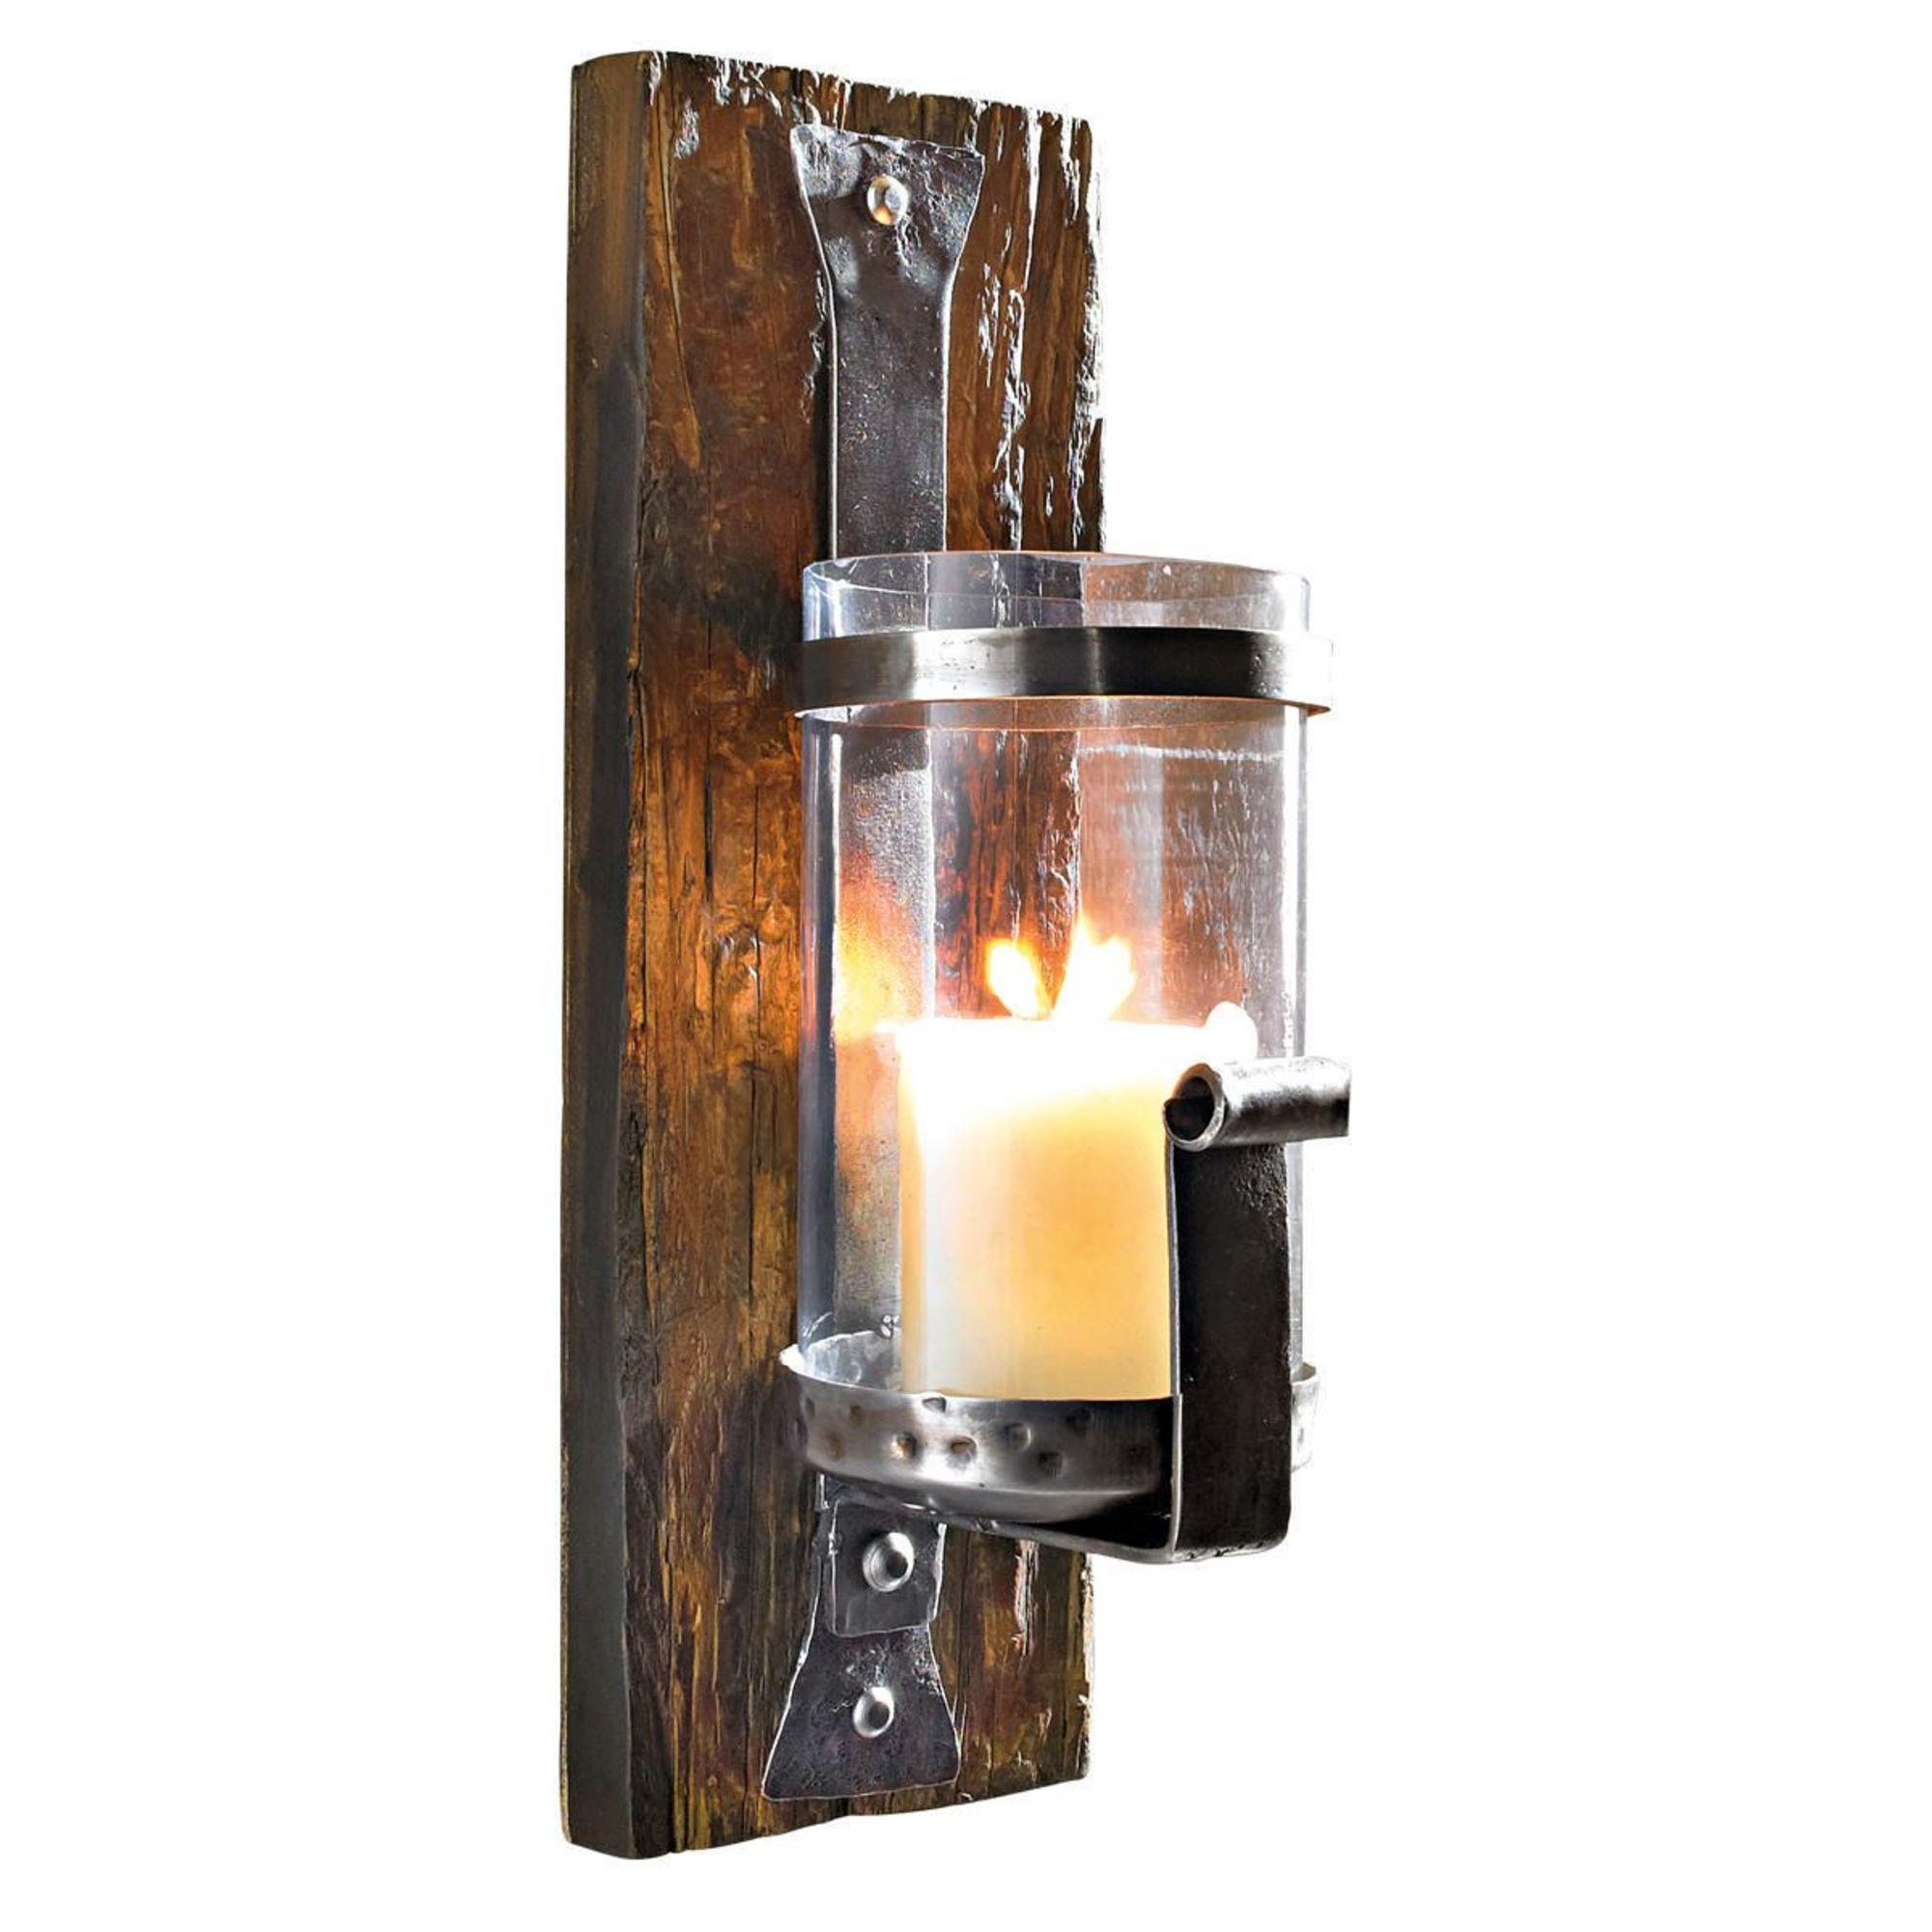 wand kerzenhalter wood aus pinienholz antik. Black Bedroom Furniture Sets. Home Design Ideas